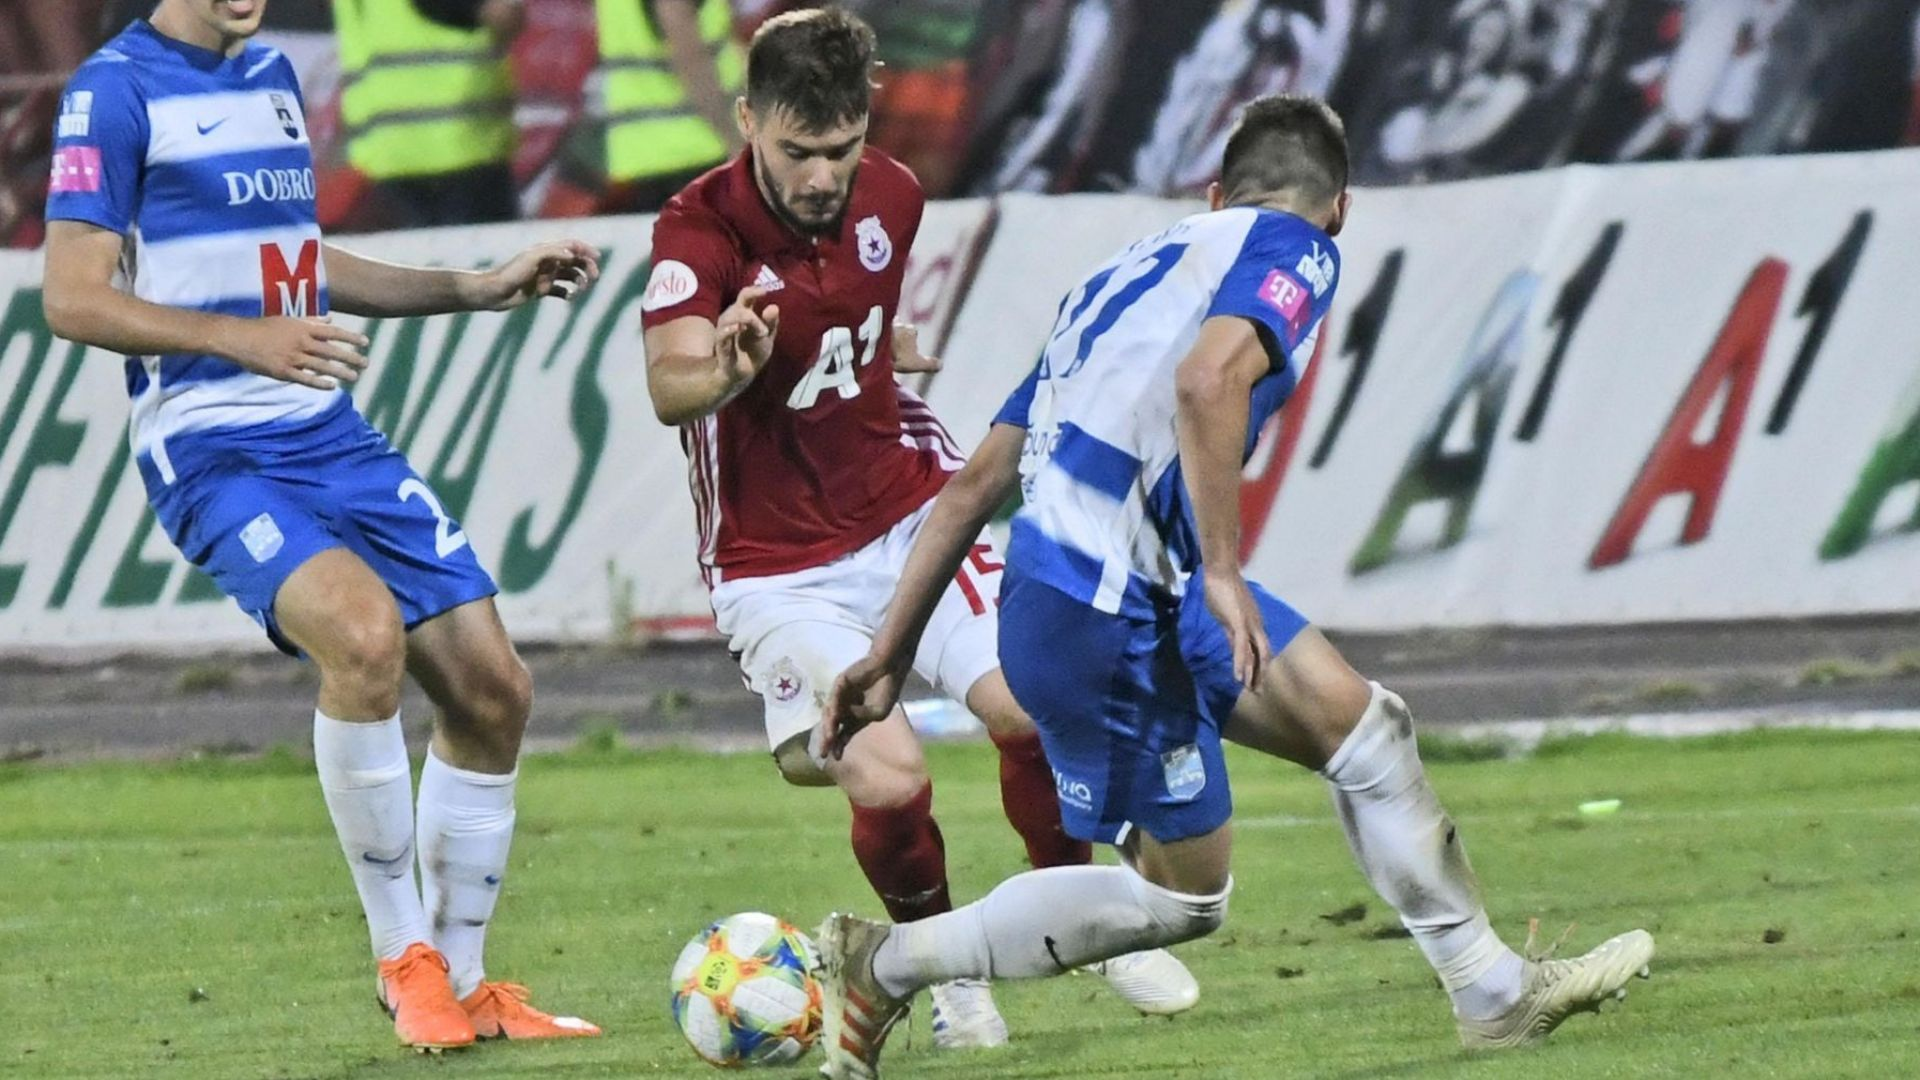 ЦСКА може да лети до Барселона, норвежци или словенци срещу Лудогорец (жребий)